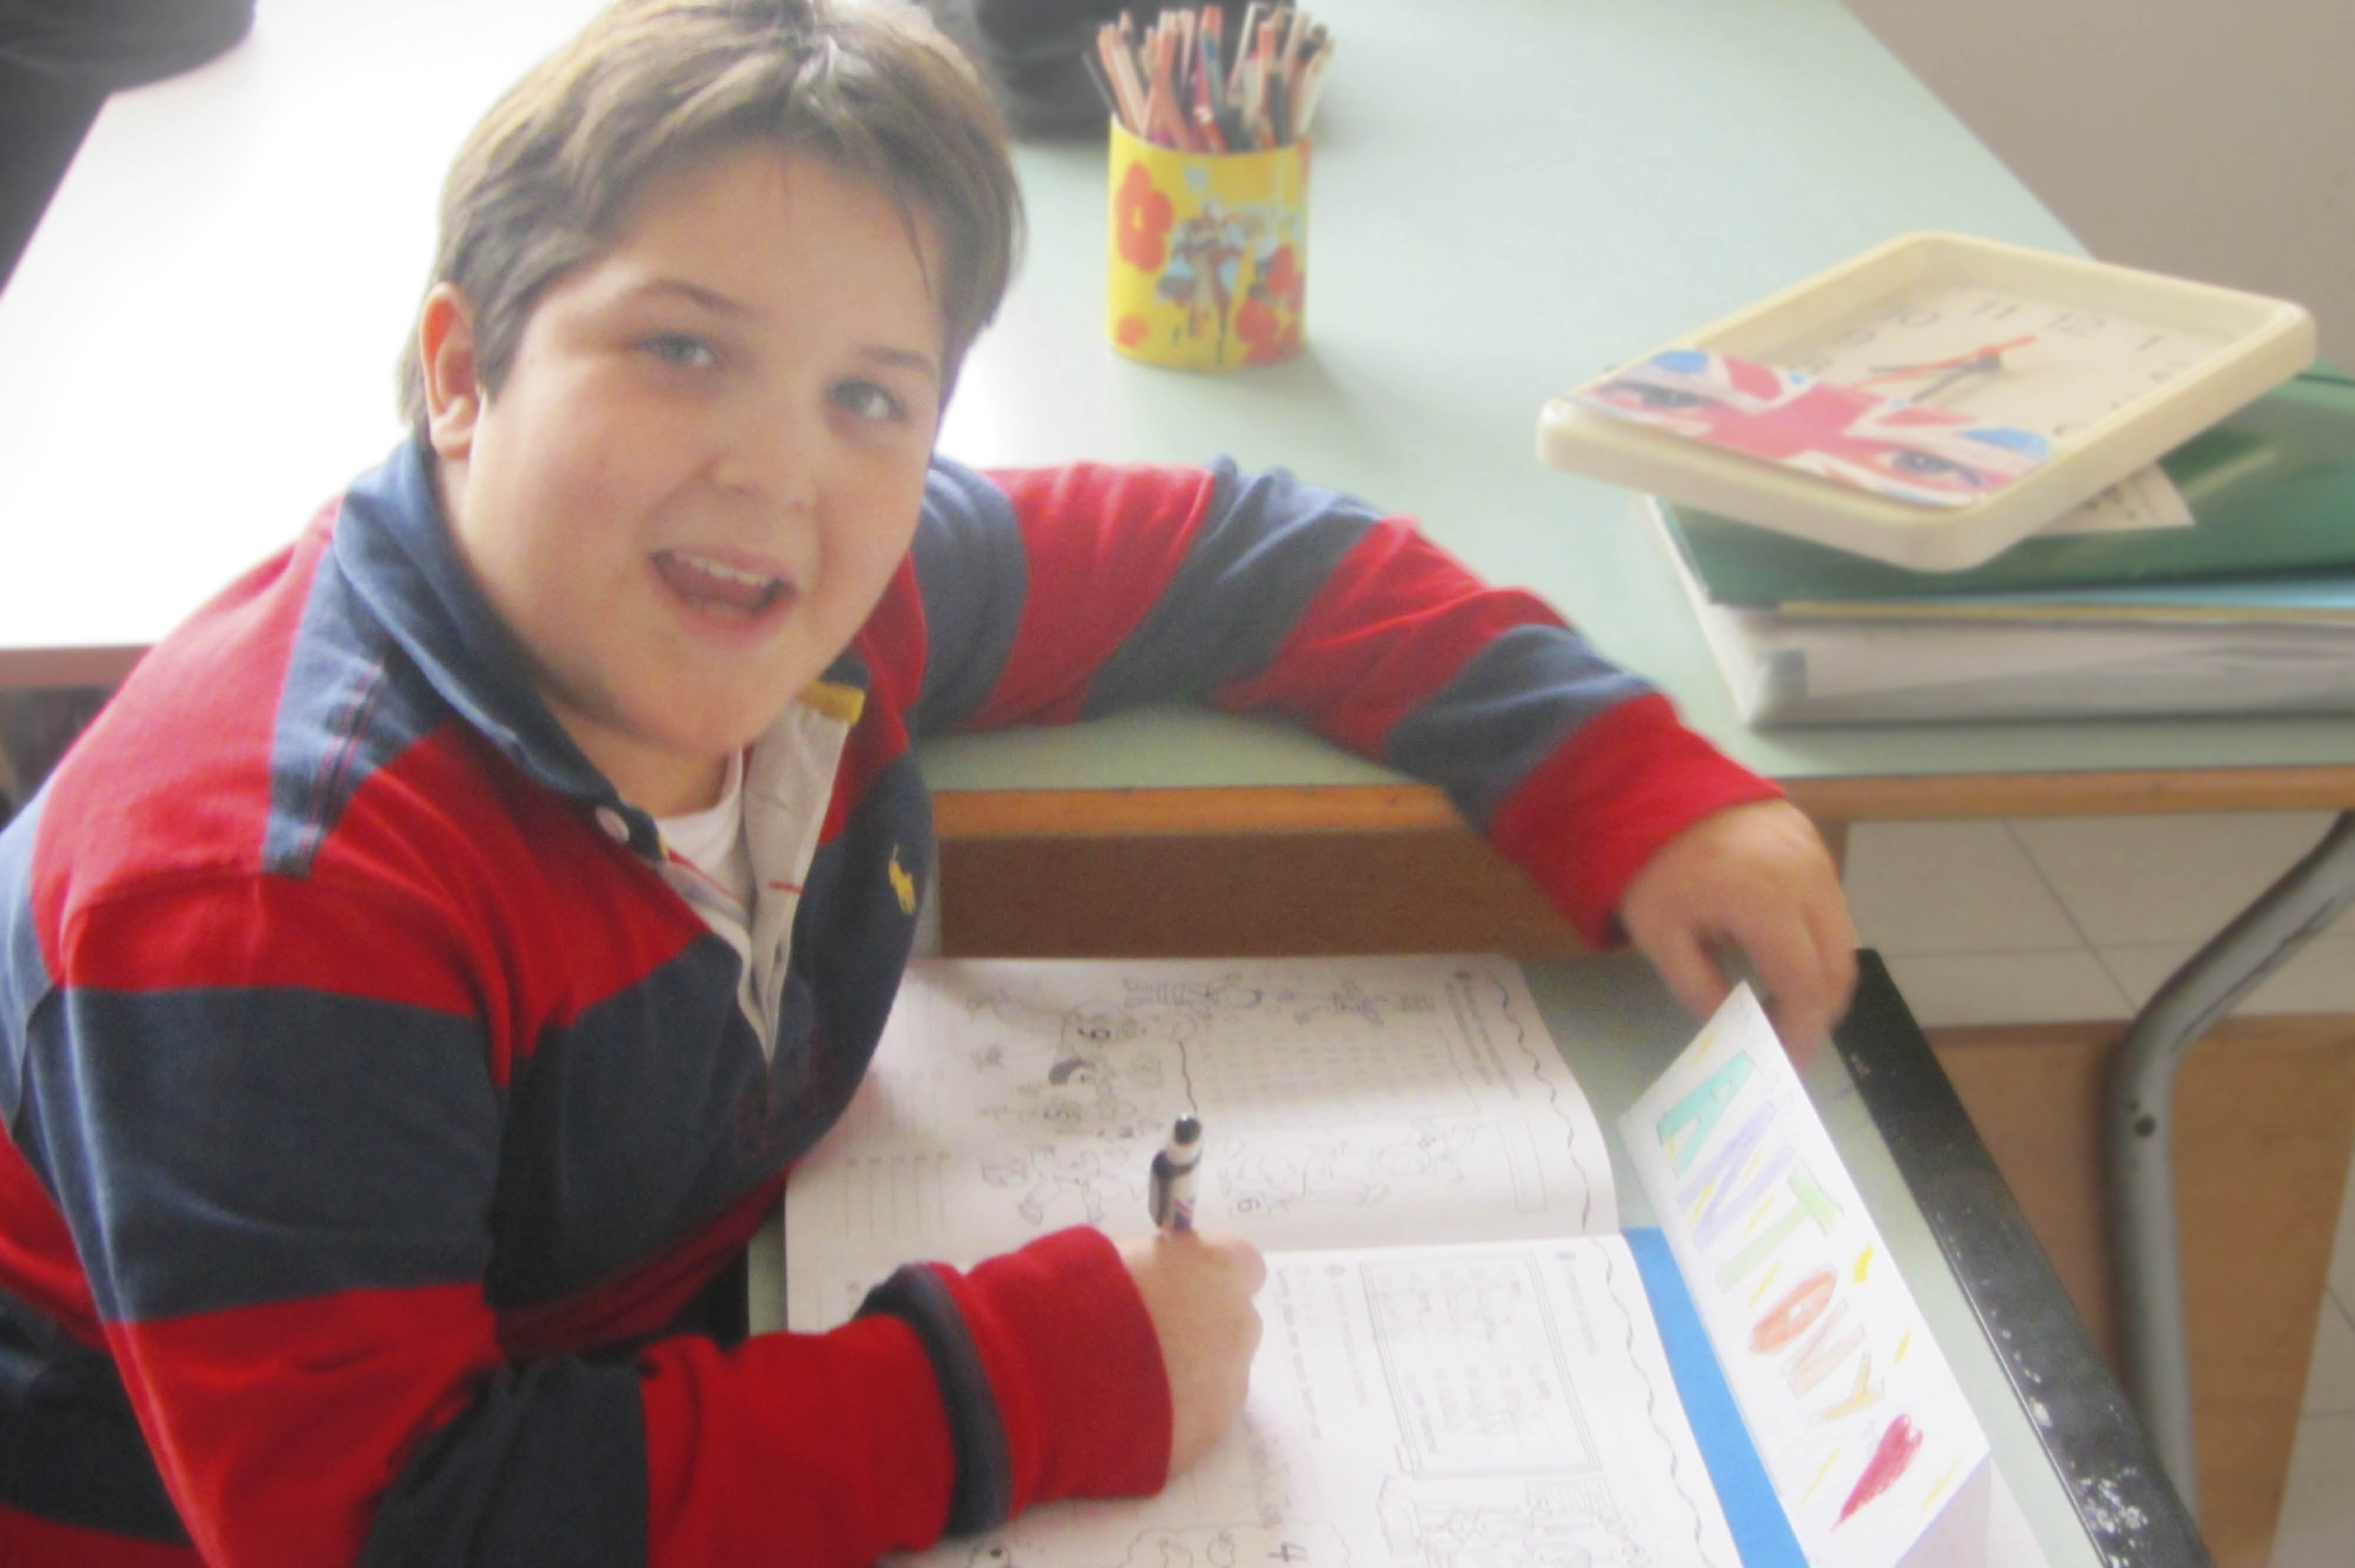 Benedict School Pomigliano d'Arco @ Somma7